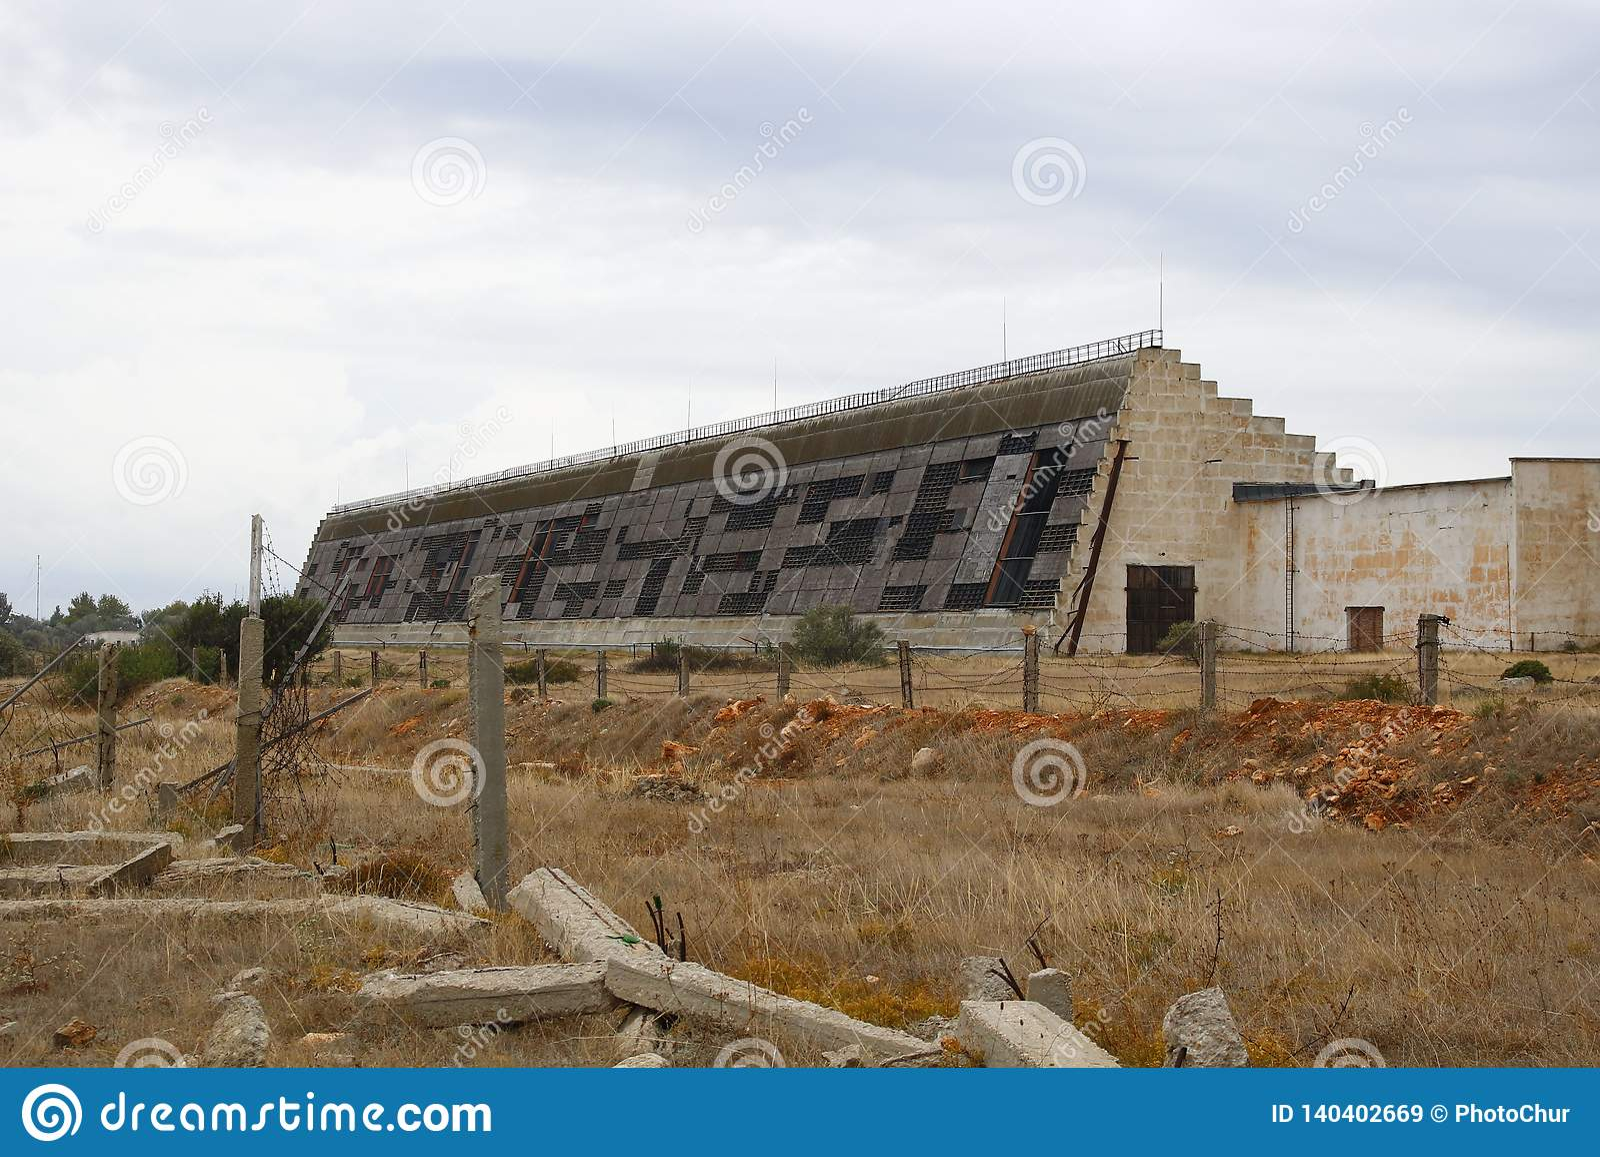 SEVASTOPOL, CRIMEA - SEPTEMBER 2014: Radar station `Dnepr`